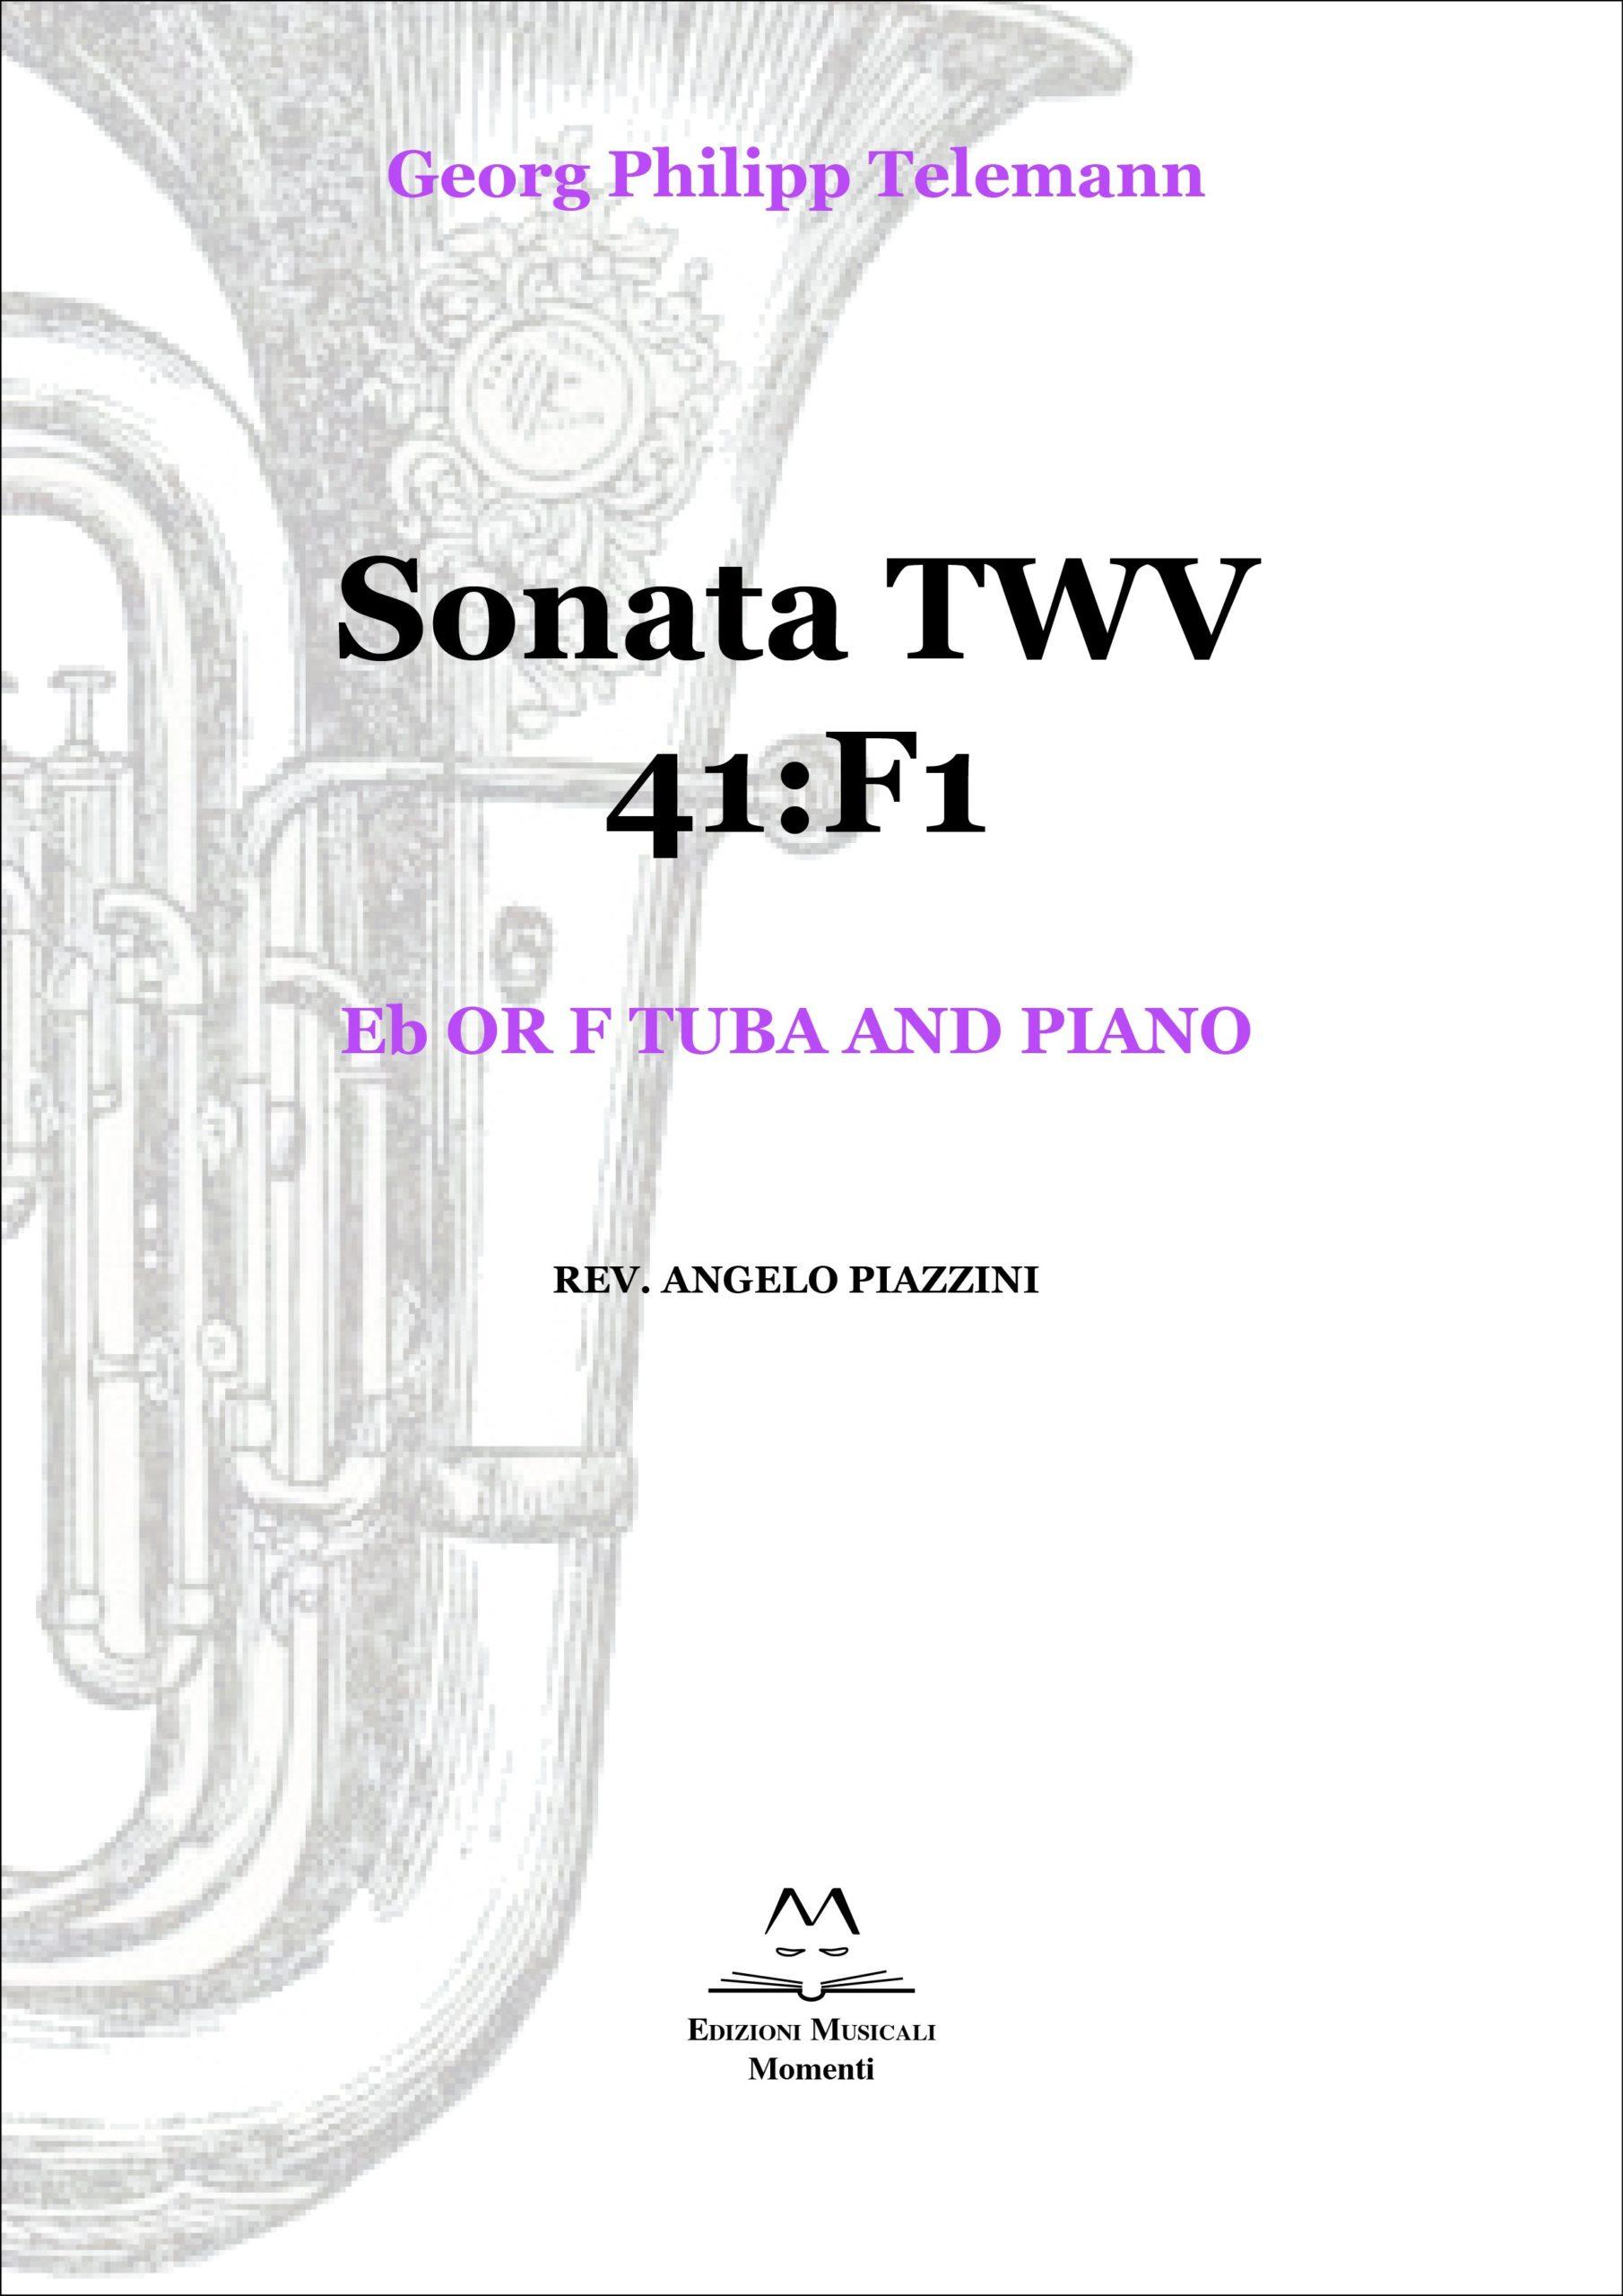 Sonata TWV 41:F1 - Eb or F tuba and piano rev. Angelo Piazzini